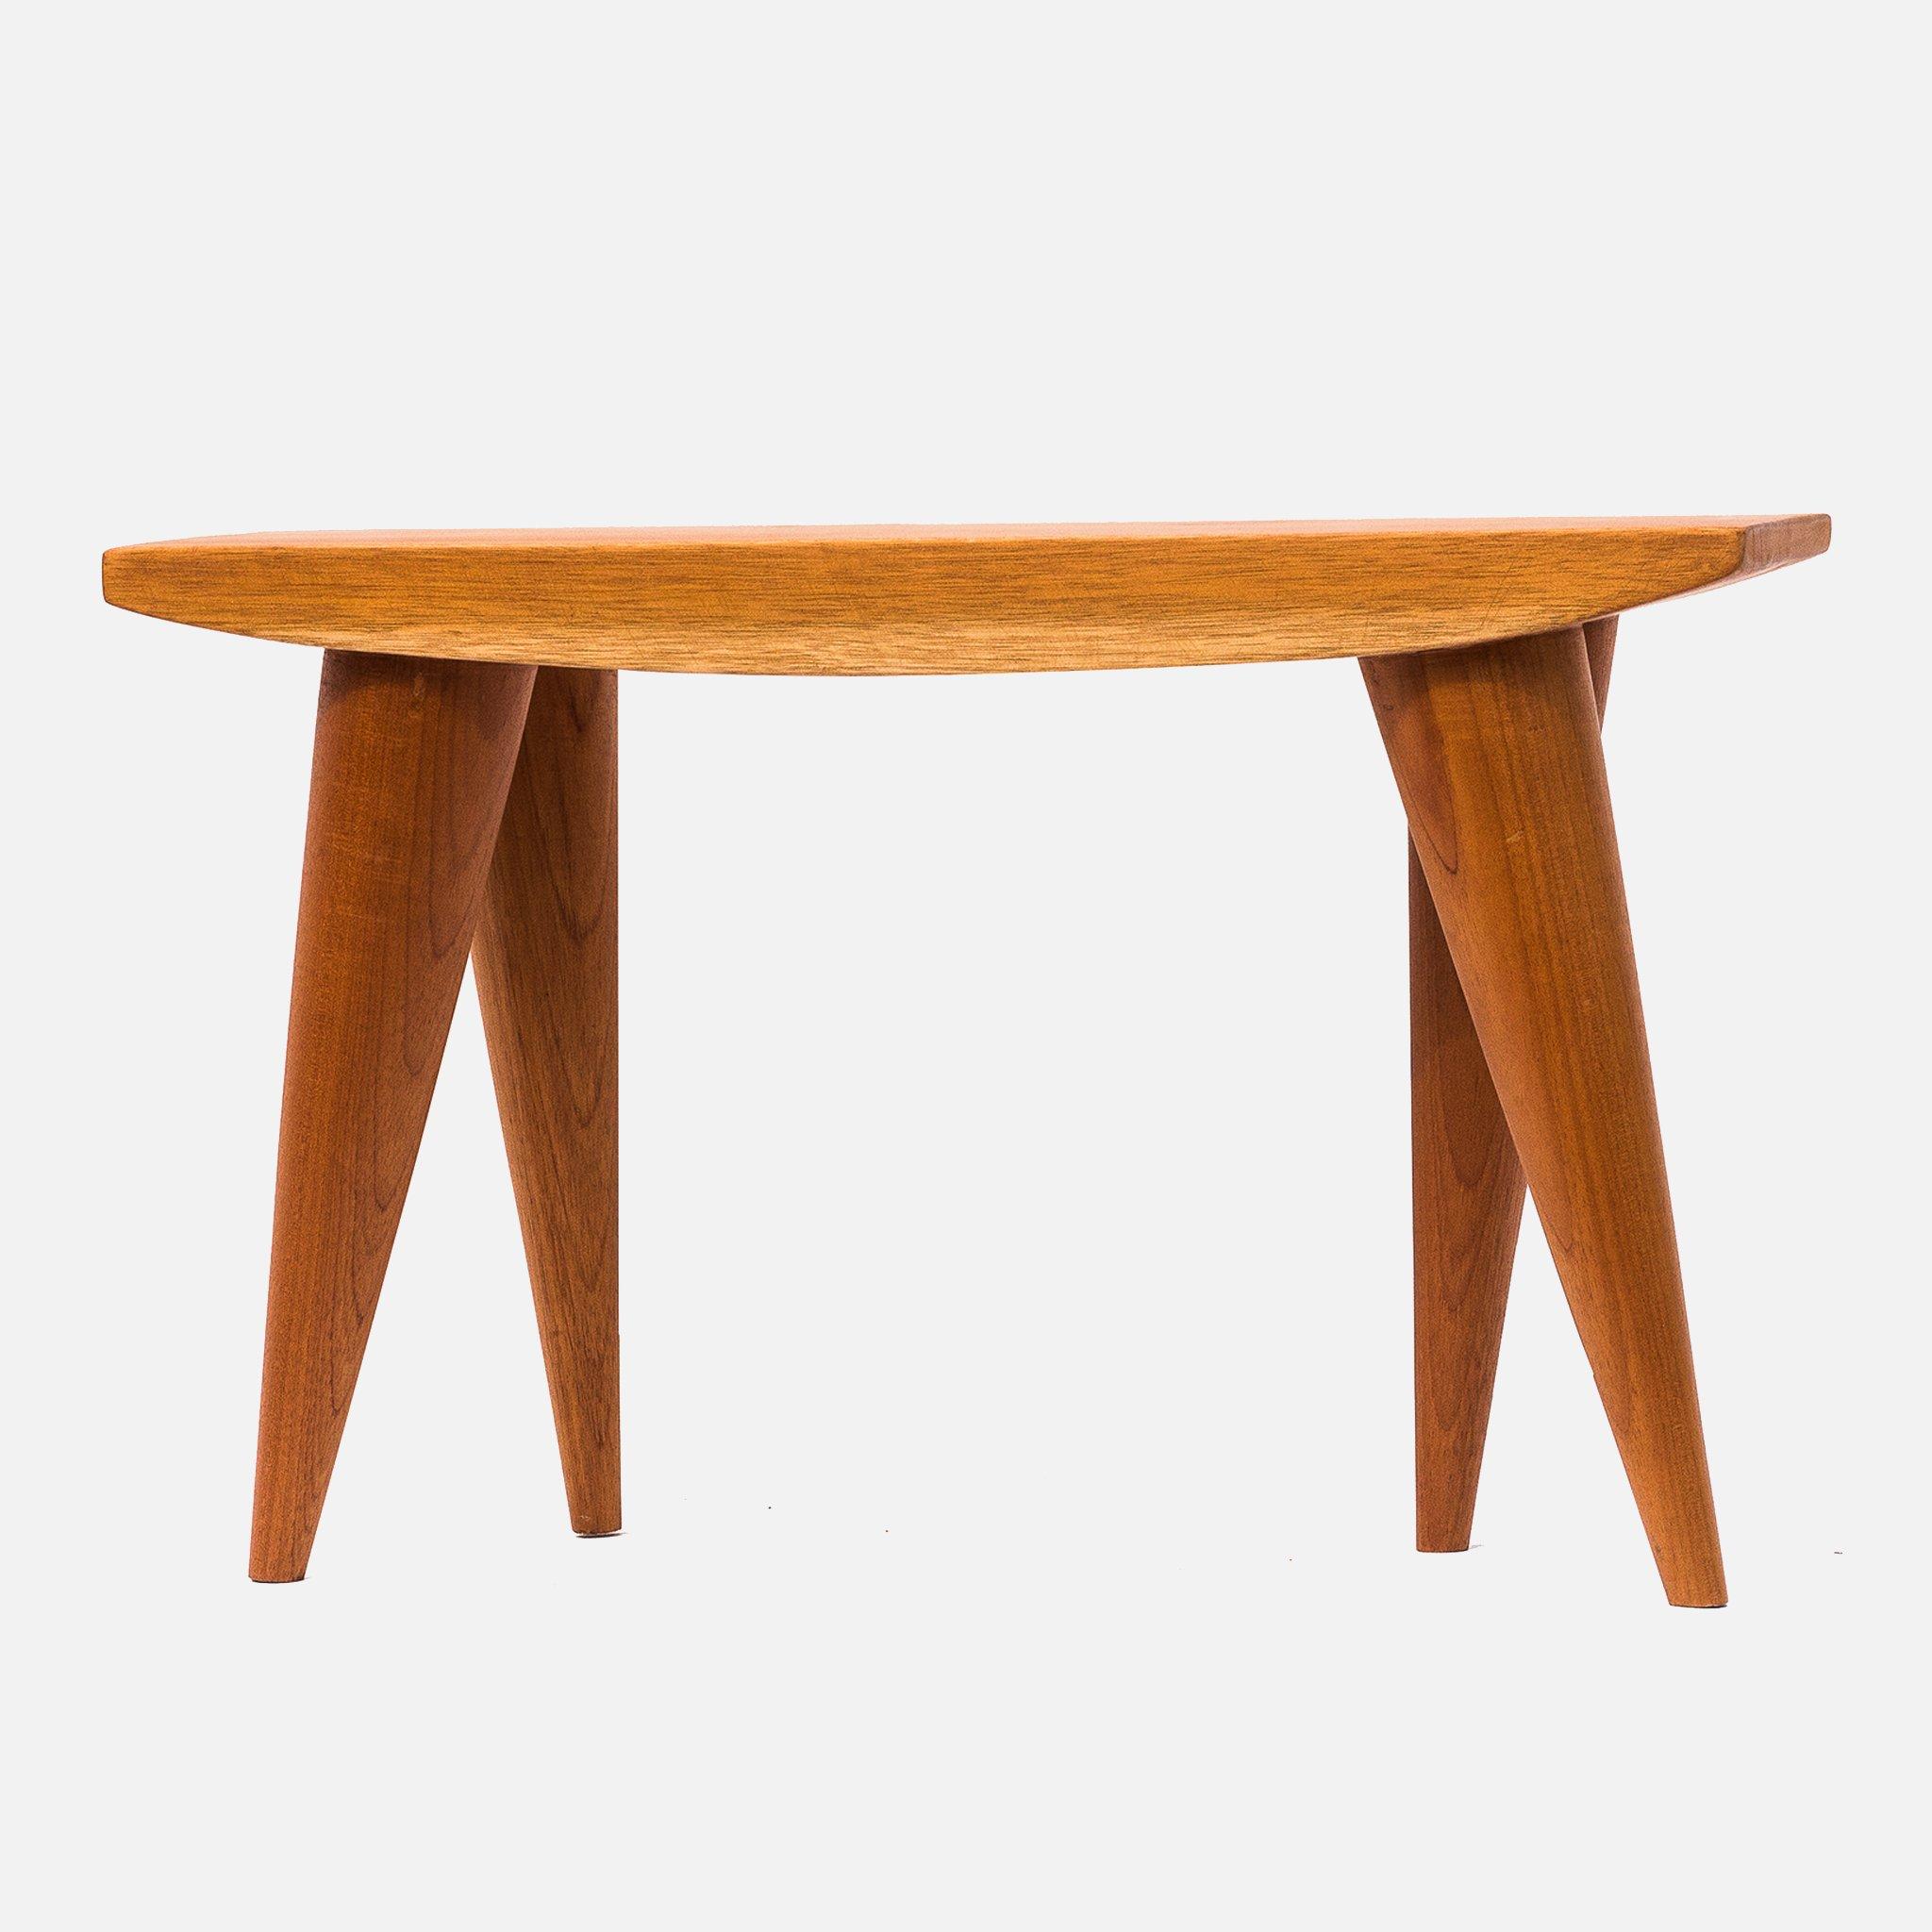 Enjoyable Walking Bench Natural Wood 54Kibo African Furniture Creativecarmelina Interior Chair Design Creativecarmelinacom